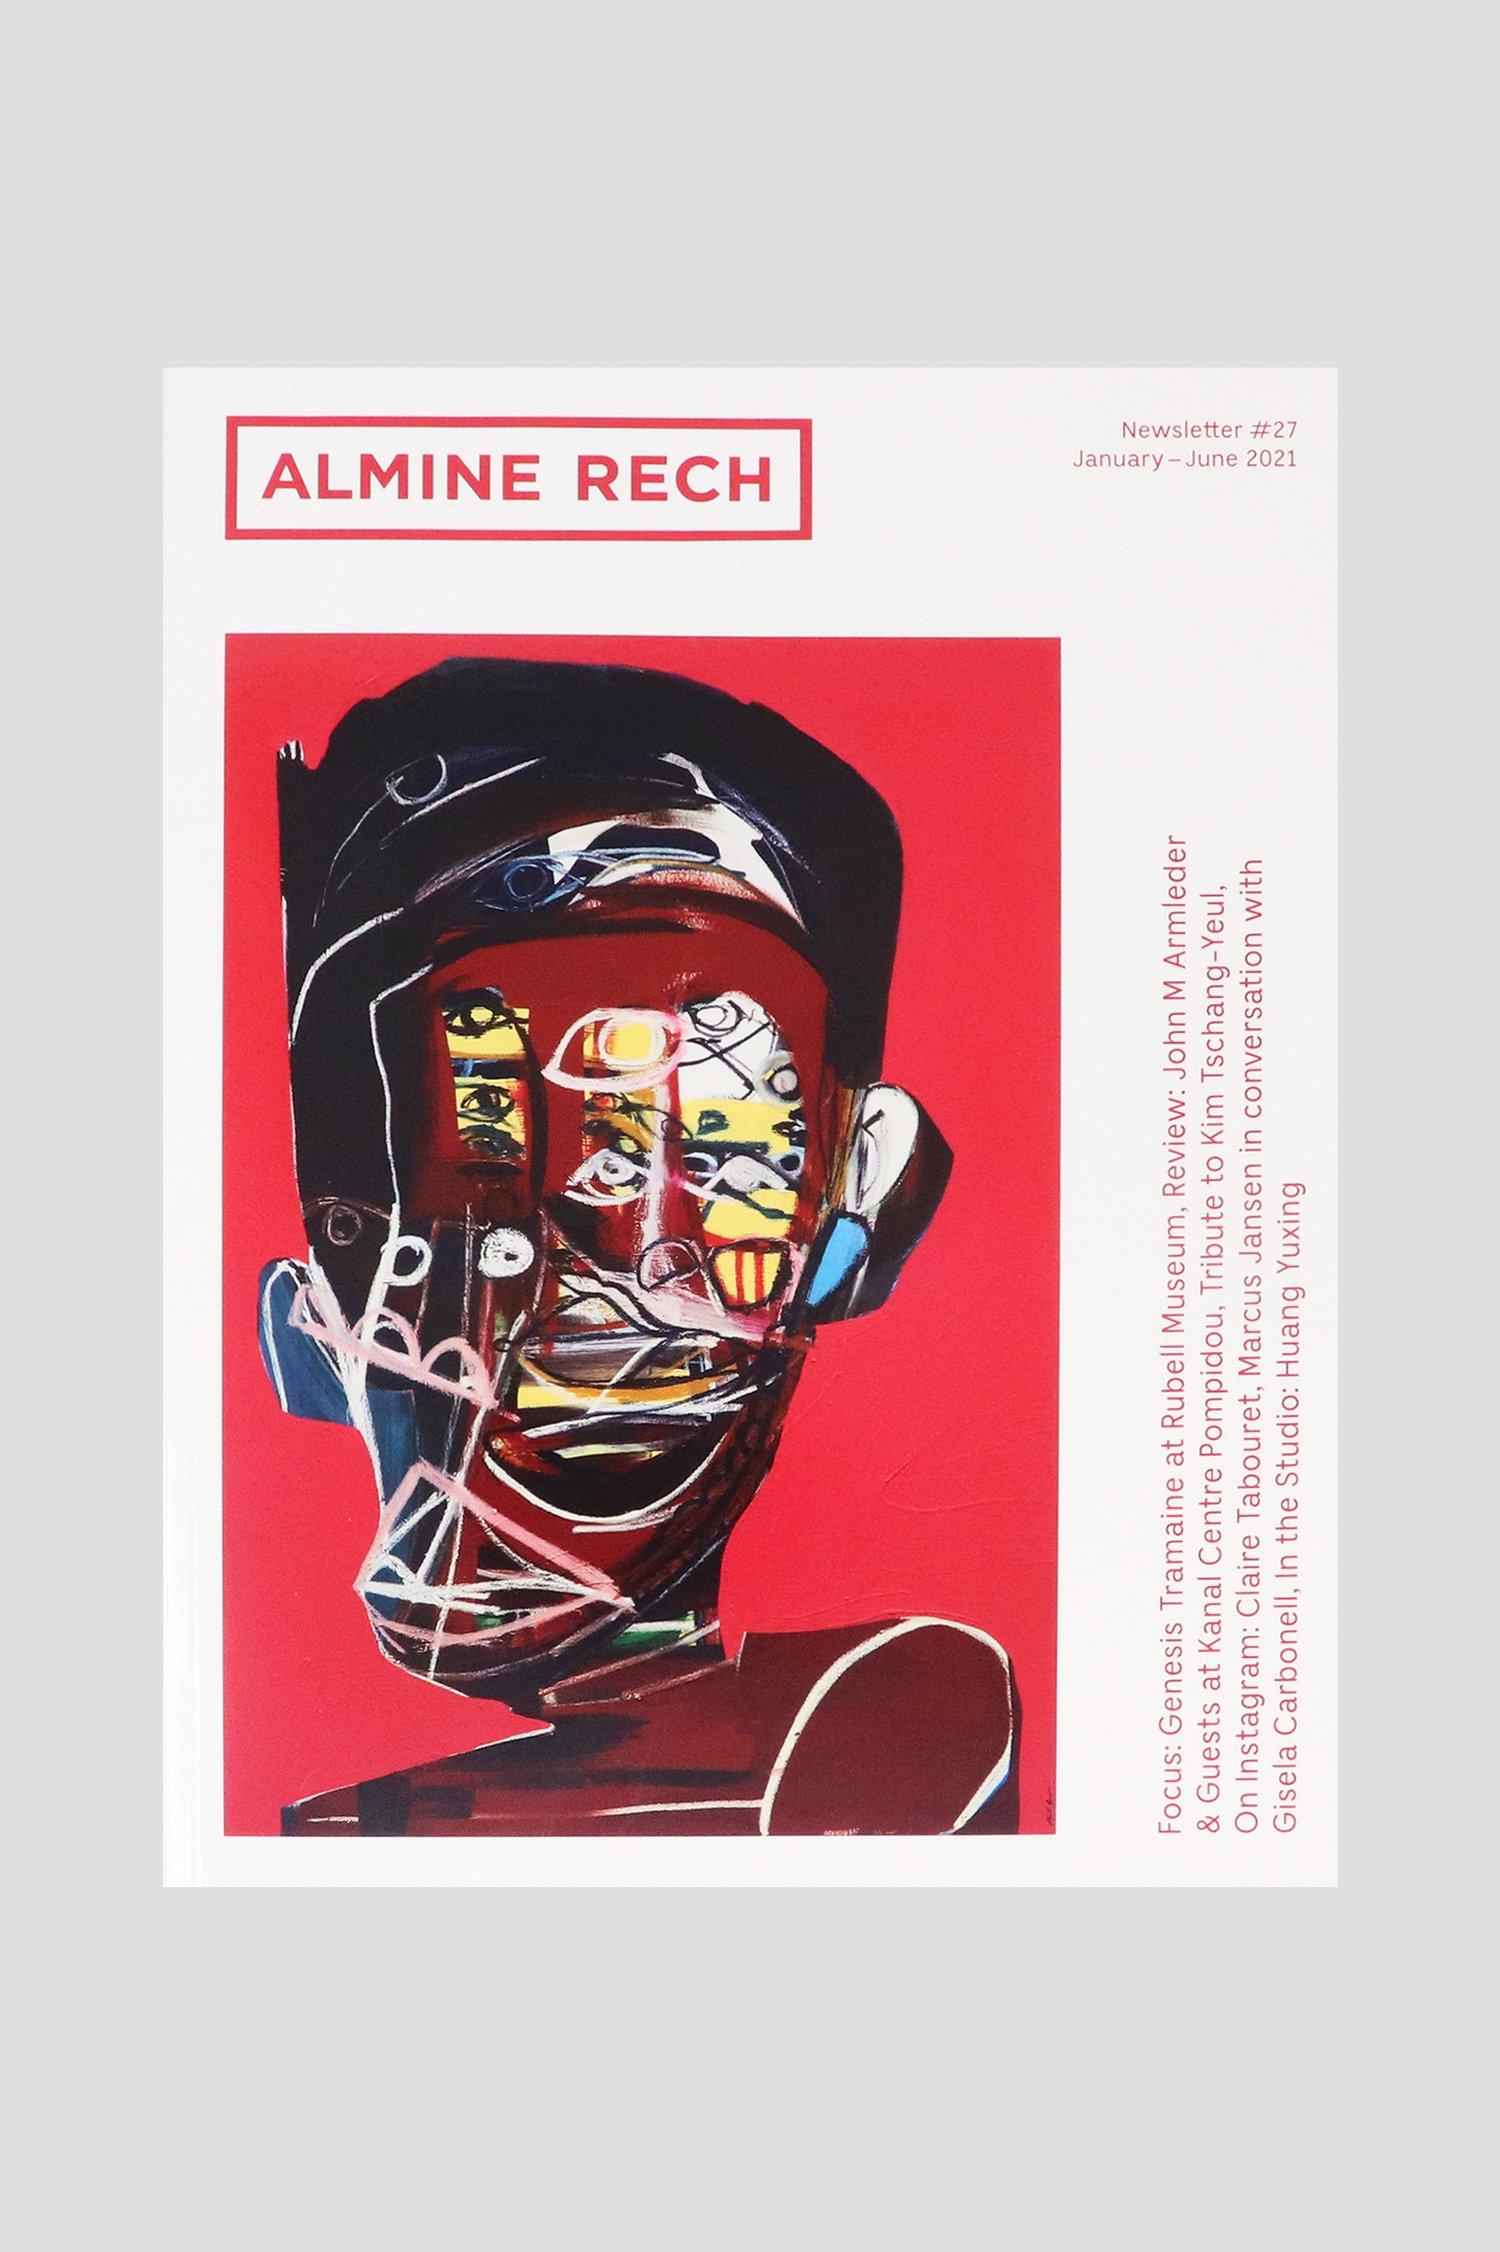 Image of Almine Rech - Newsletter #27